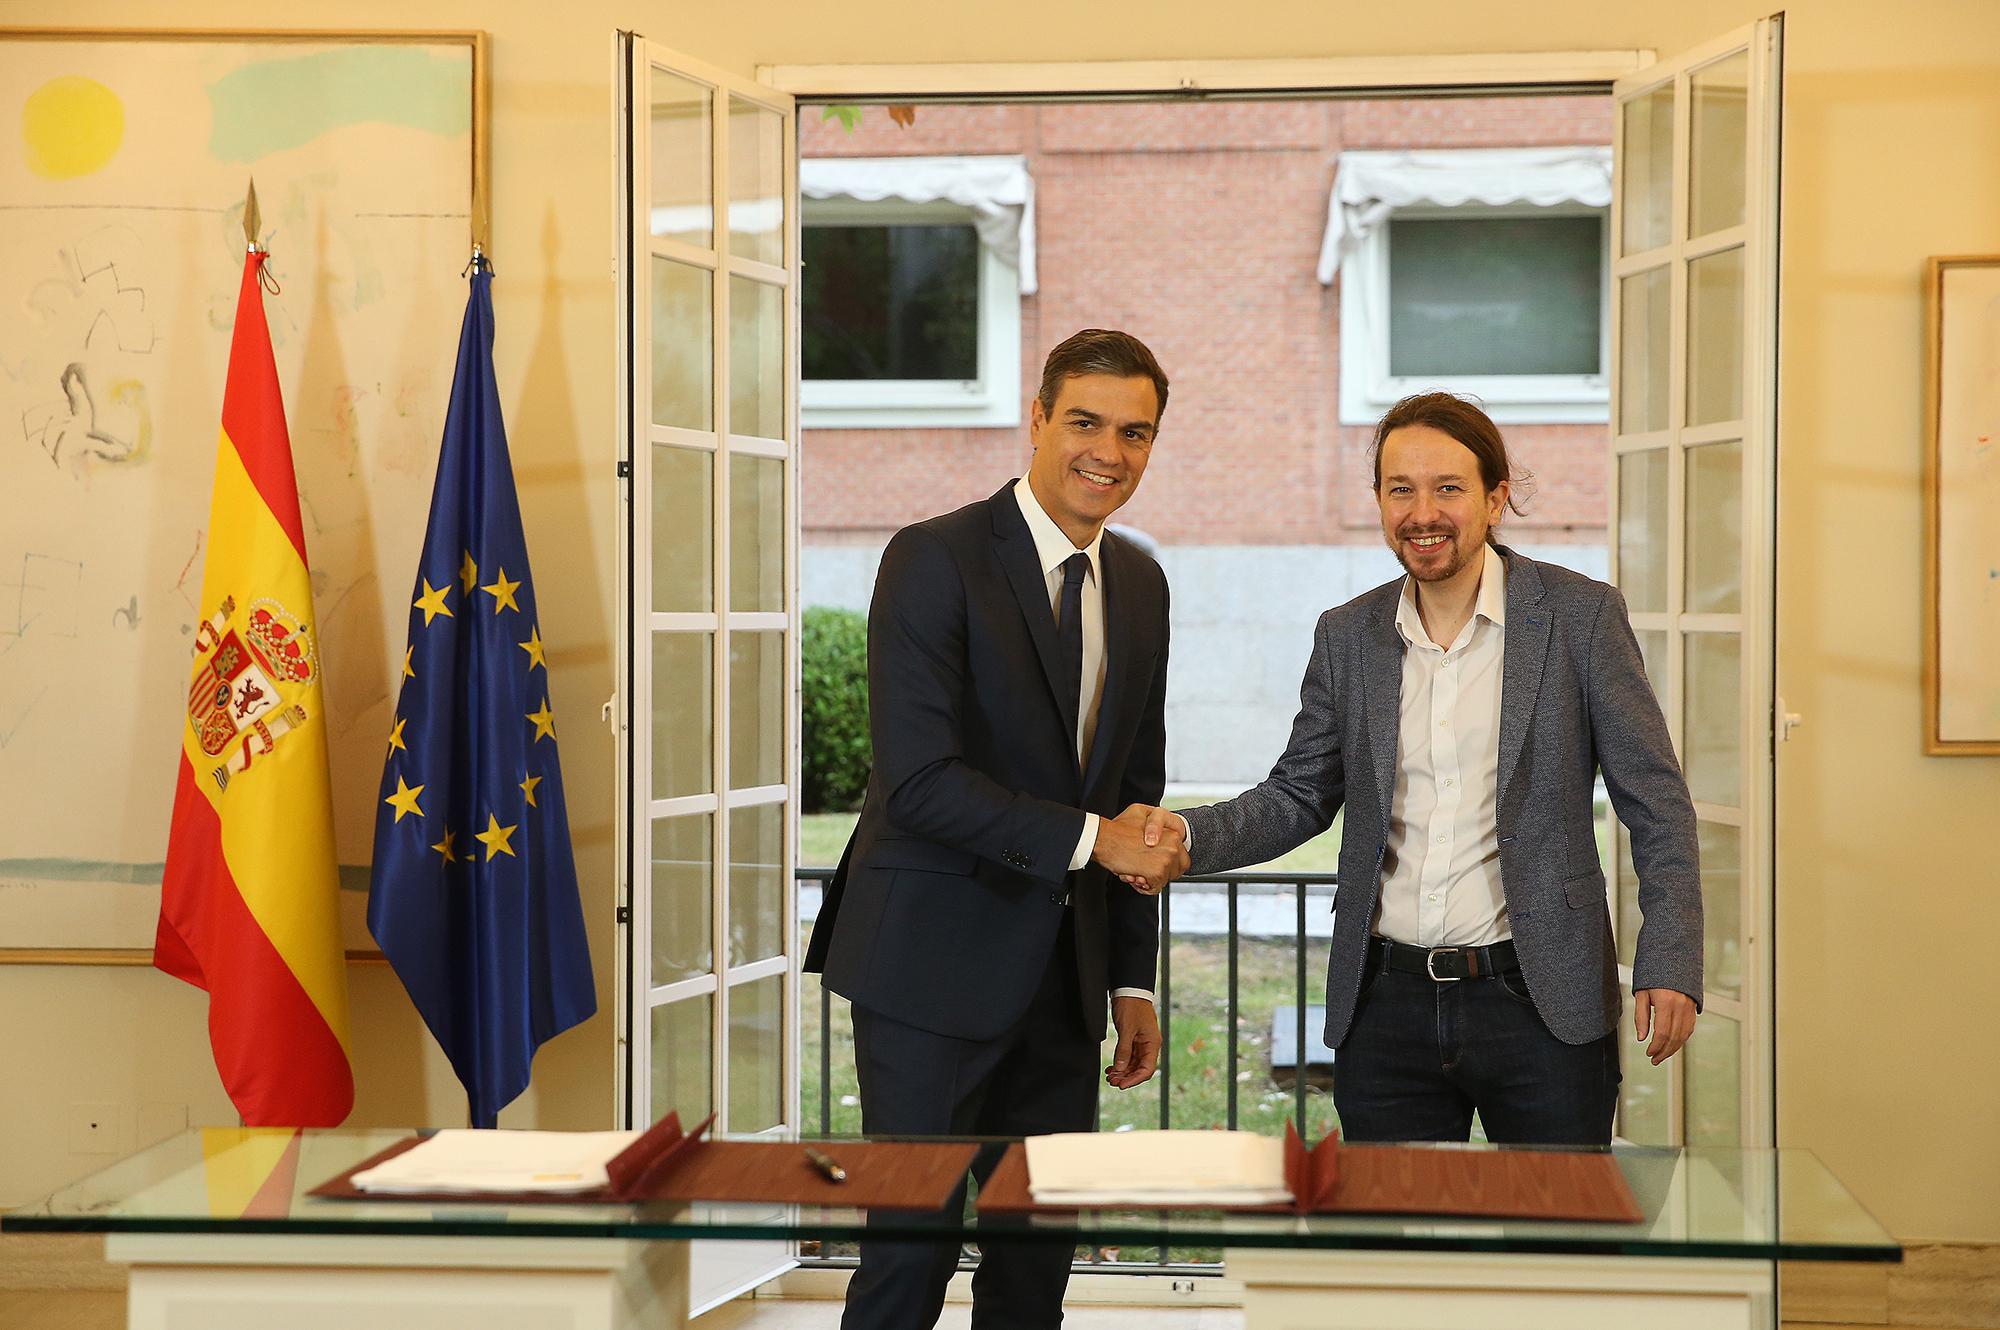 File:Sánchez e Iglesias firman un acuerdo para los PGE 2019.jpg - Wikimedia  Commons